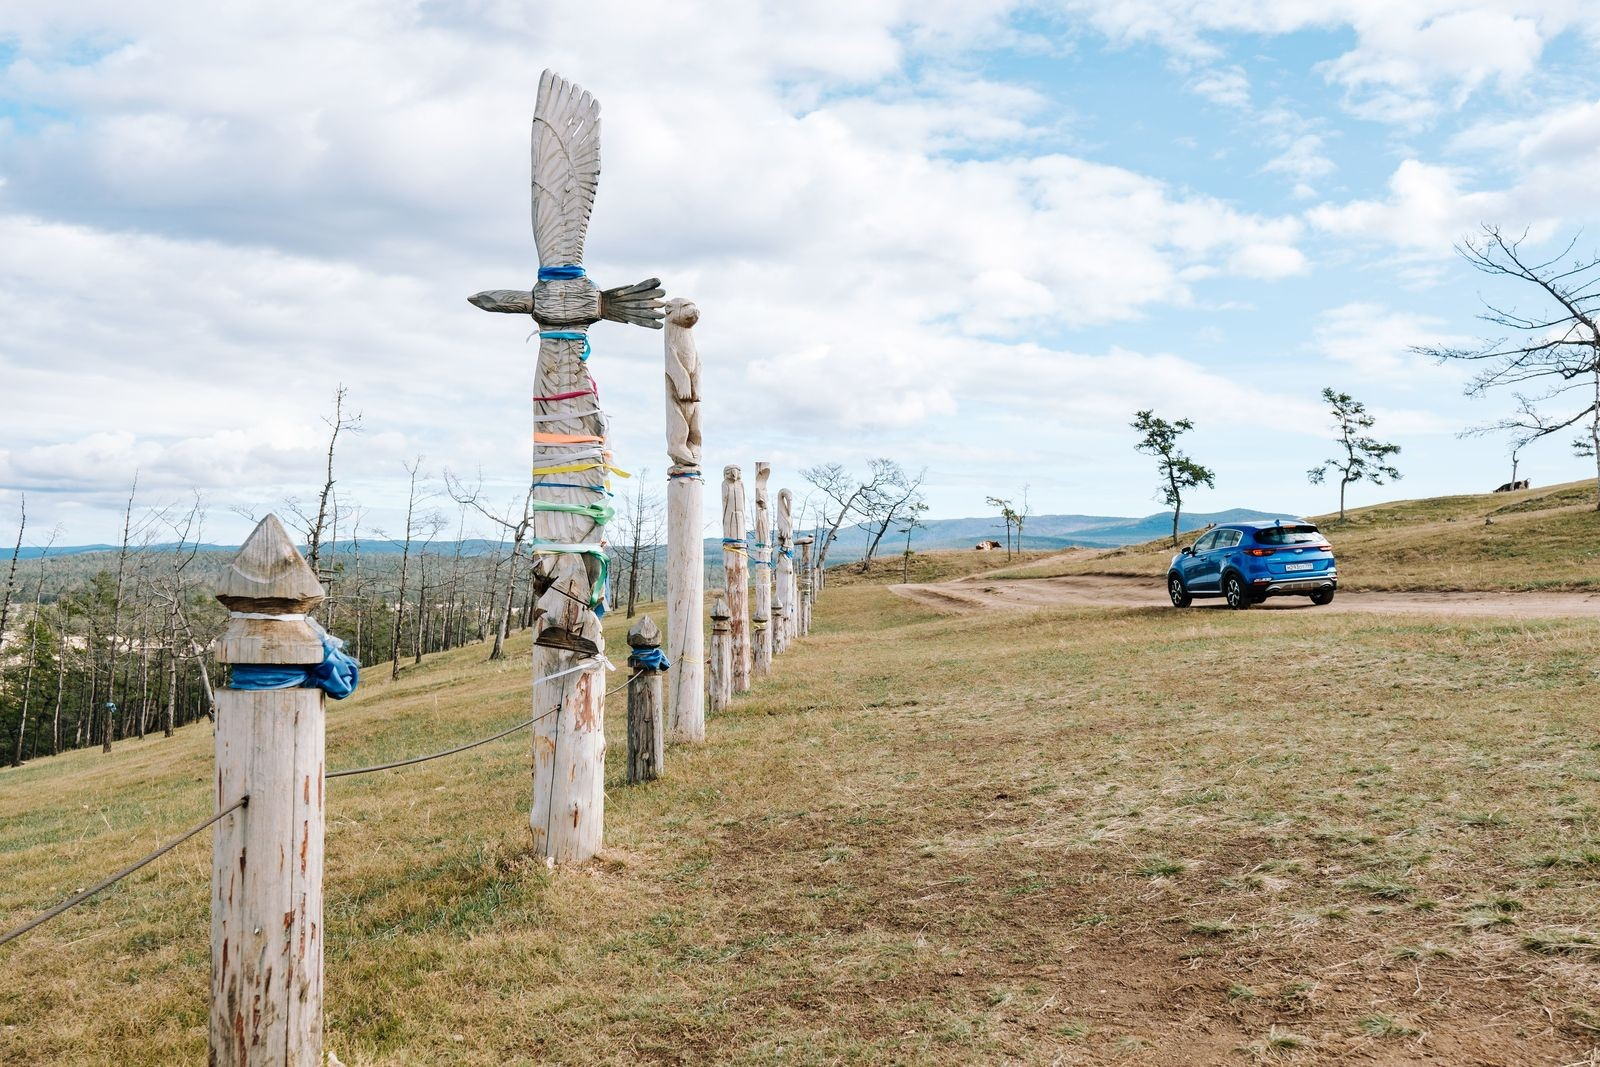 Дизель хоронили, с «буханками» гонялись… Экспедиционный тест Kia Sportage 2020